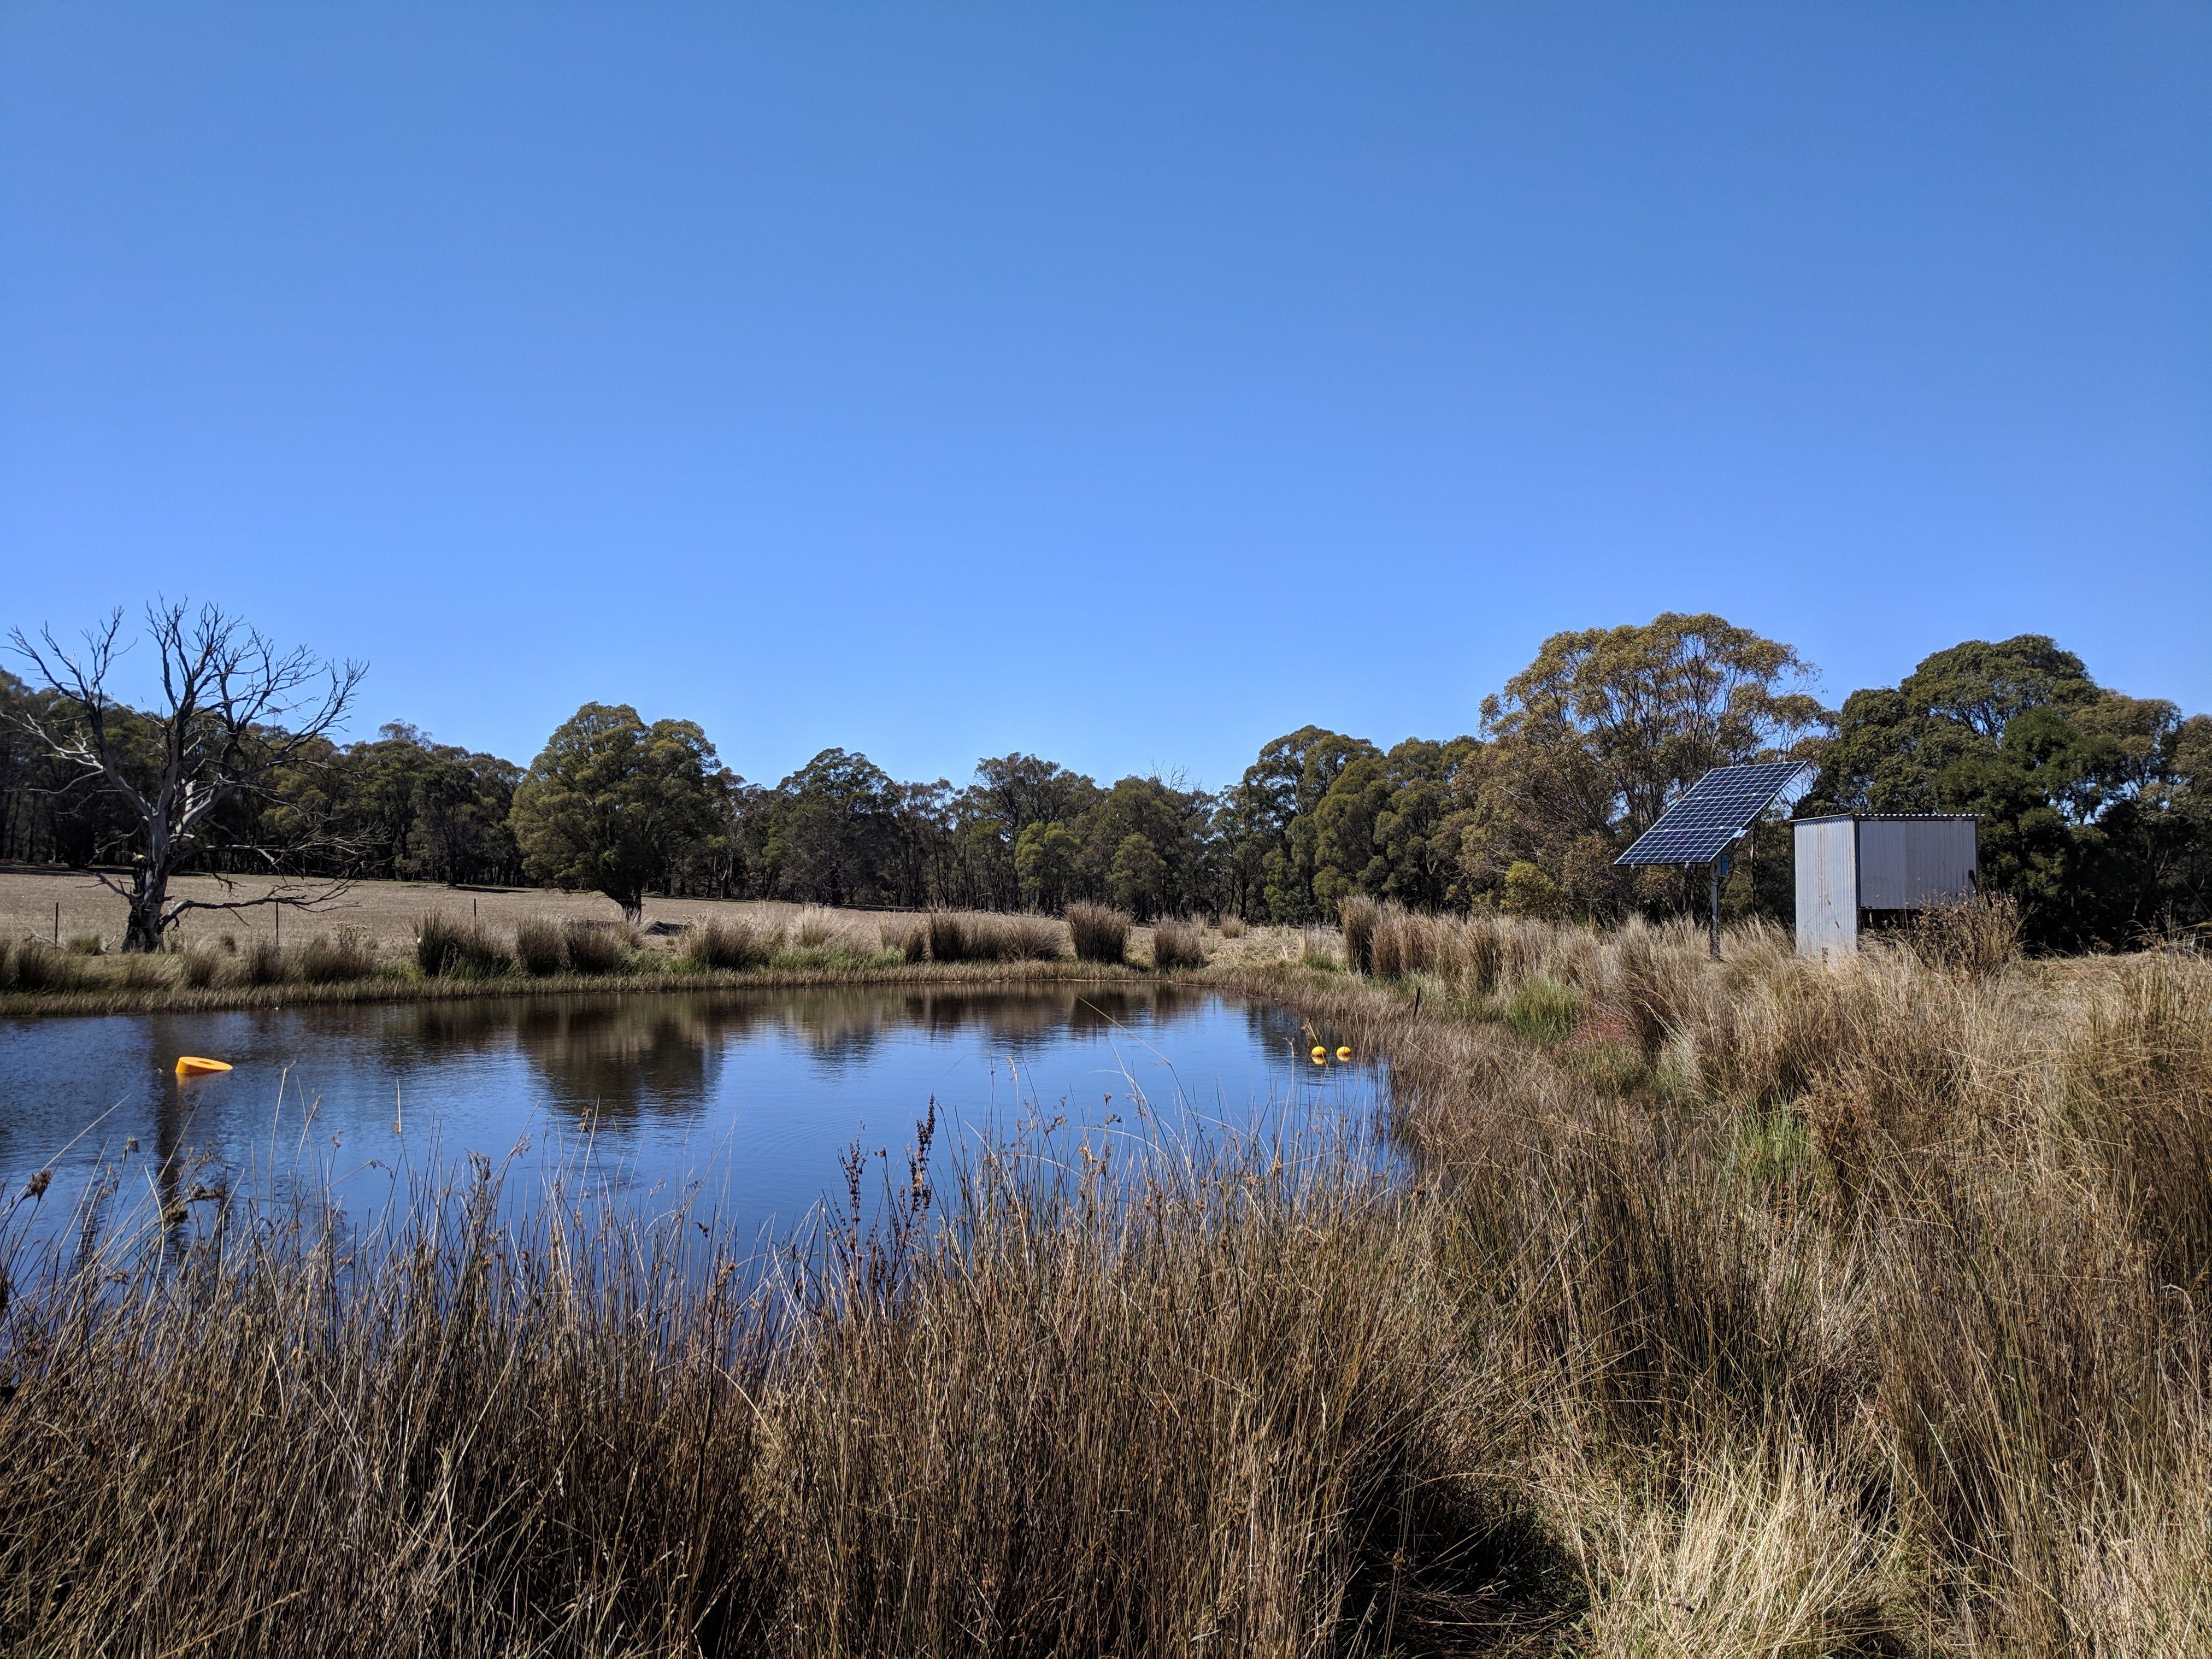 Goulburn, Australia, February 2019